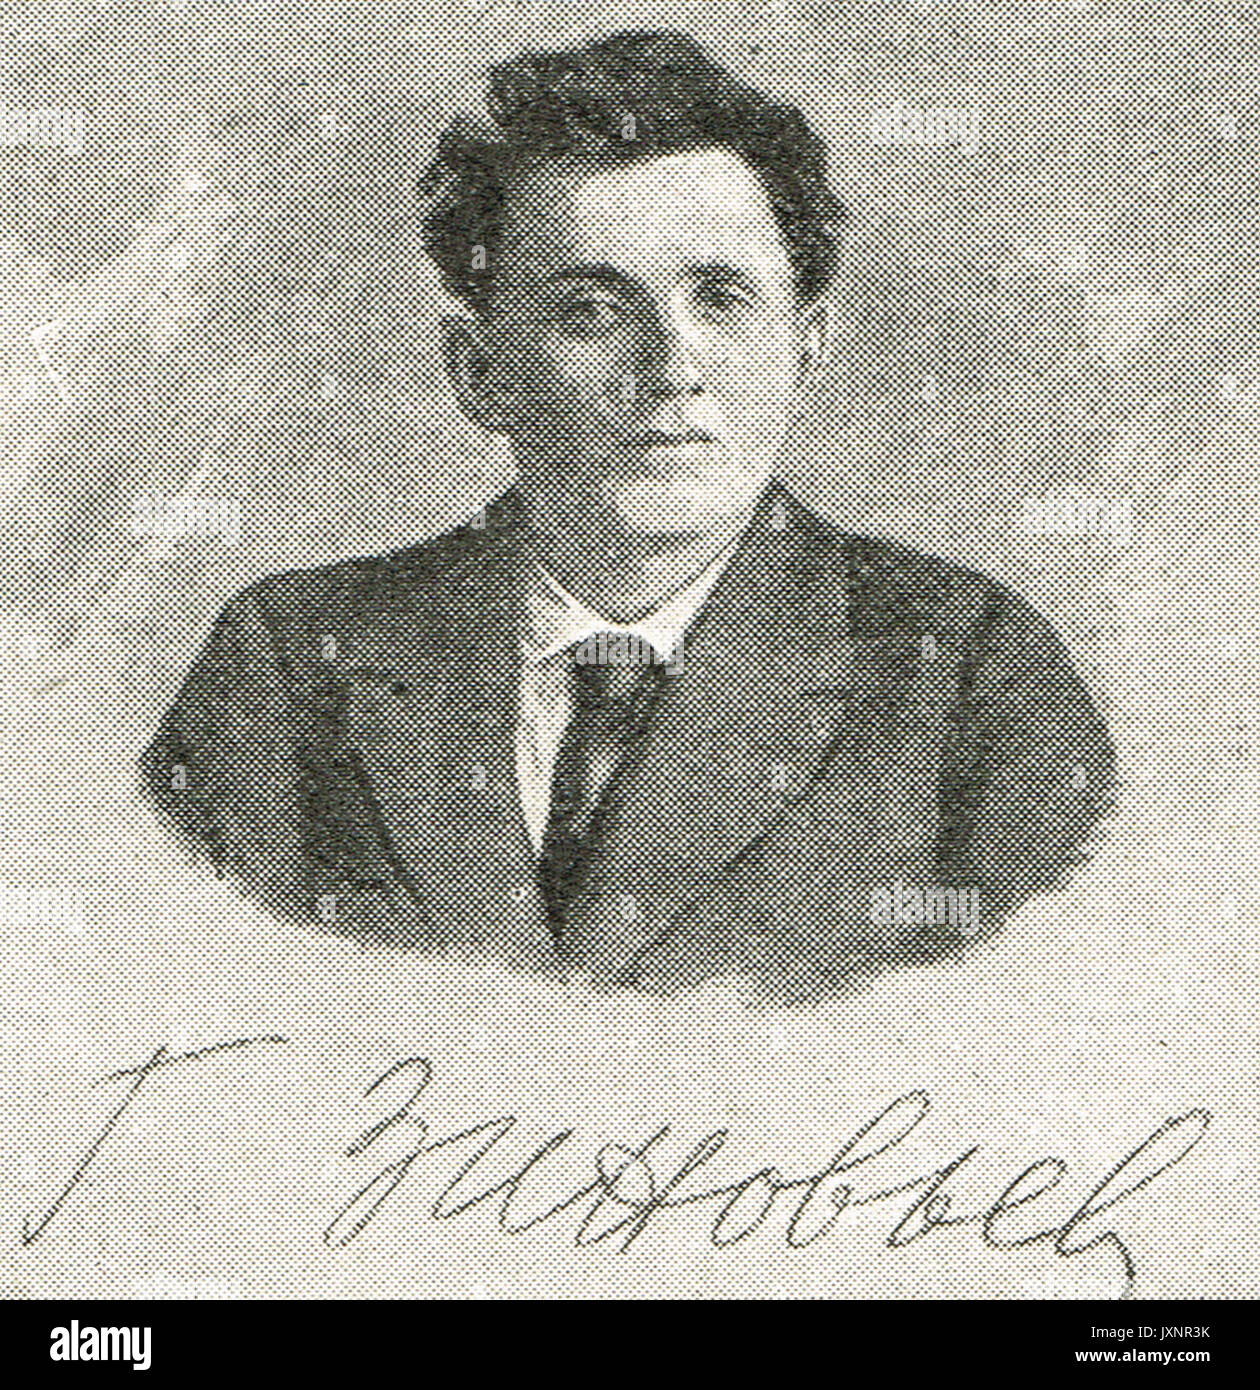 Grigory Zinoviev portrait & signature - Stock Image